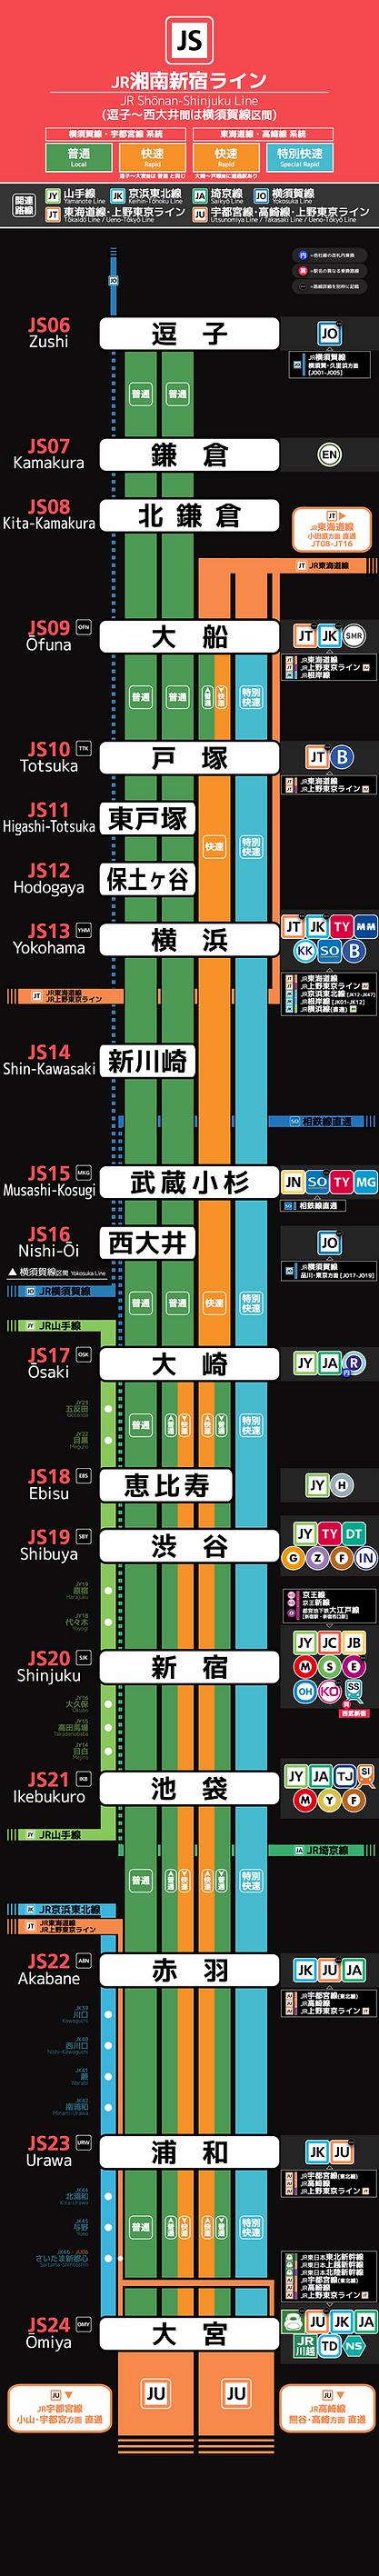 JR湘南新宿ライン2_2020-03-06.png